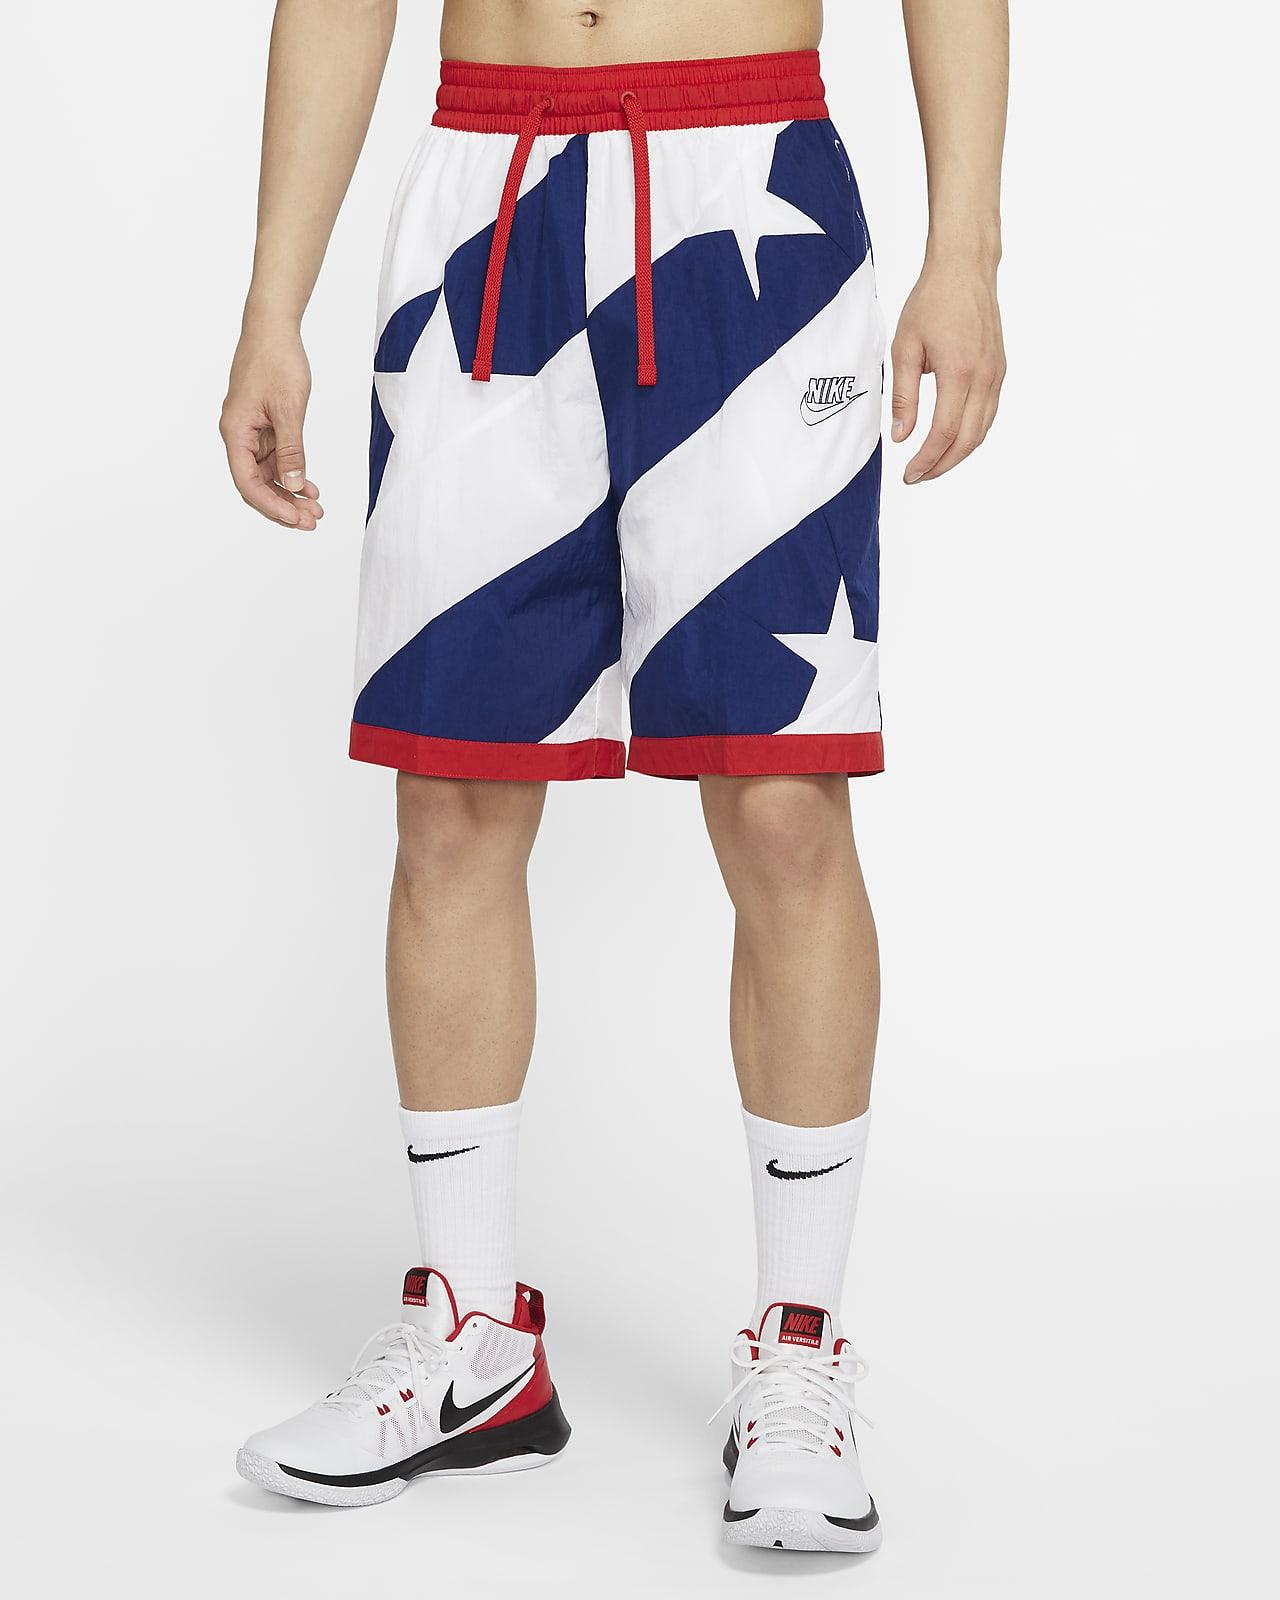 Nike Dri-FIT Throwback Herren-Basketballshorts